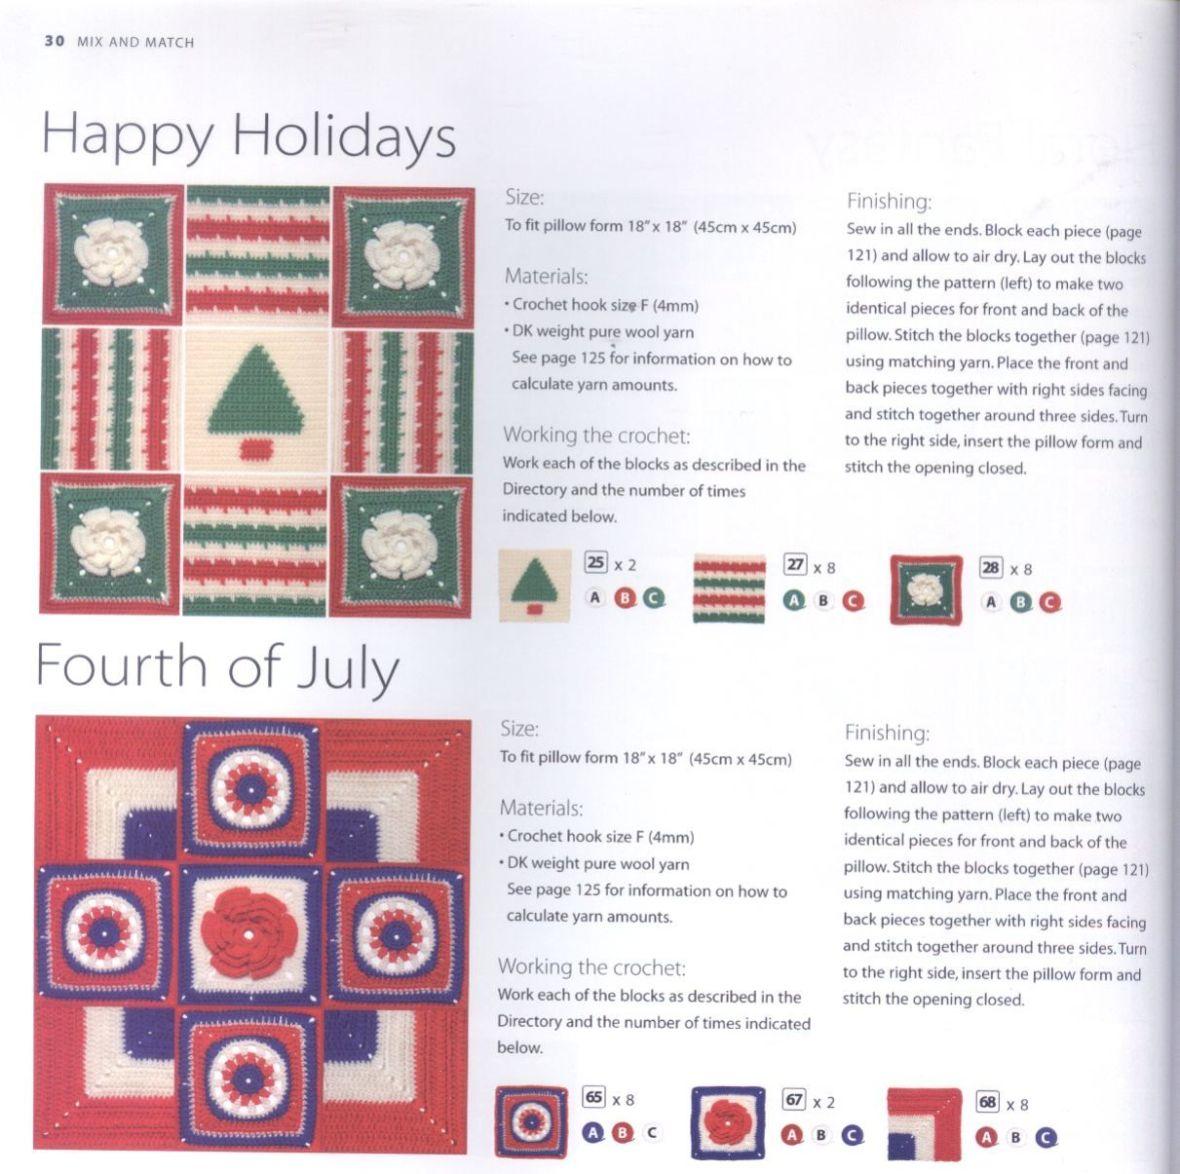 200 Crocheted Blocks for blankets, throws & Afghans 030